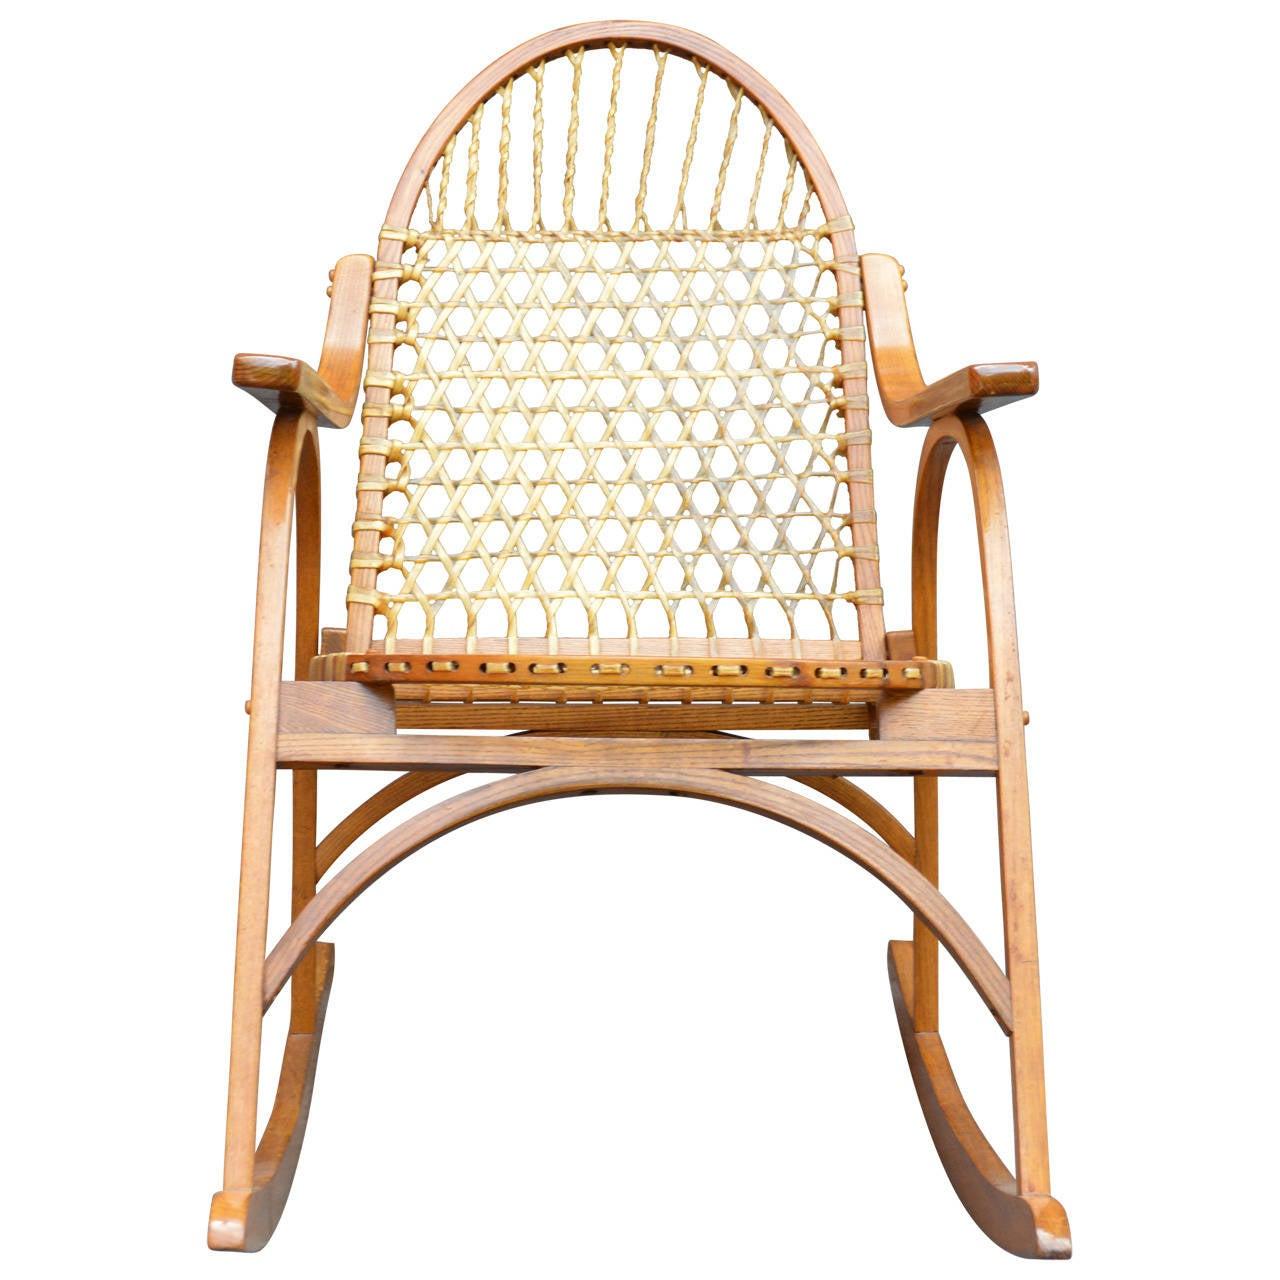 Tremendous Vermont Tubbs Snowshoe Rocking Chair Pabps2019 Chair Design Images Pabps2019Com